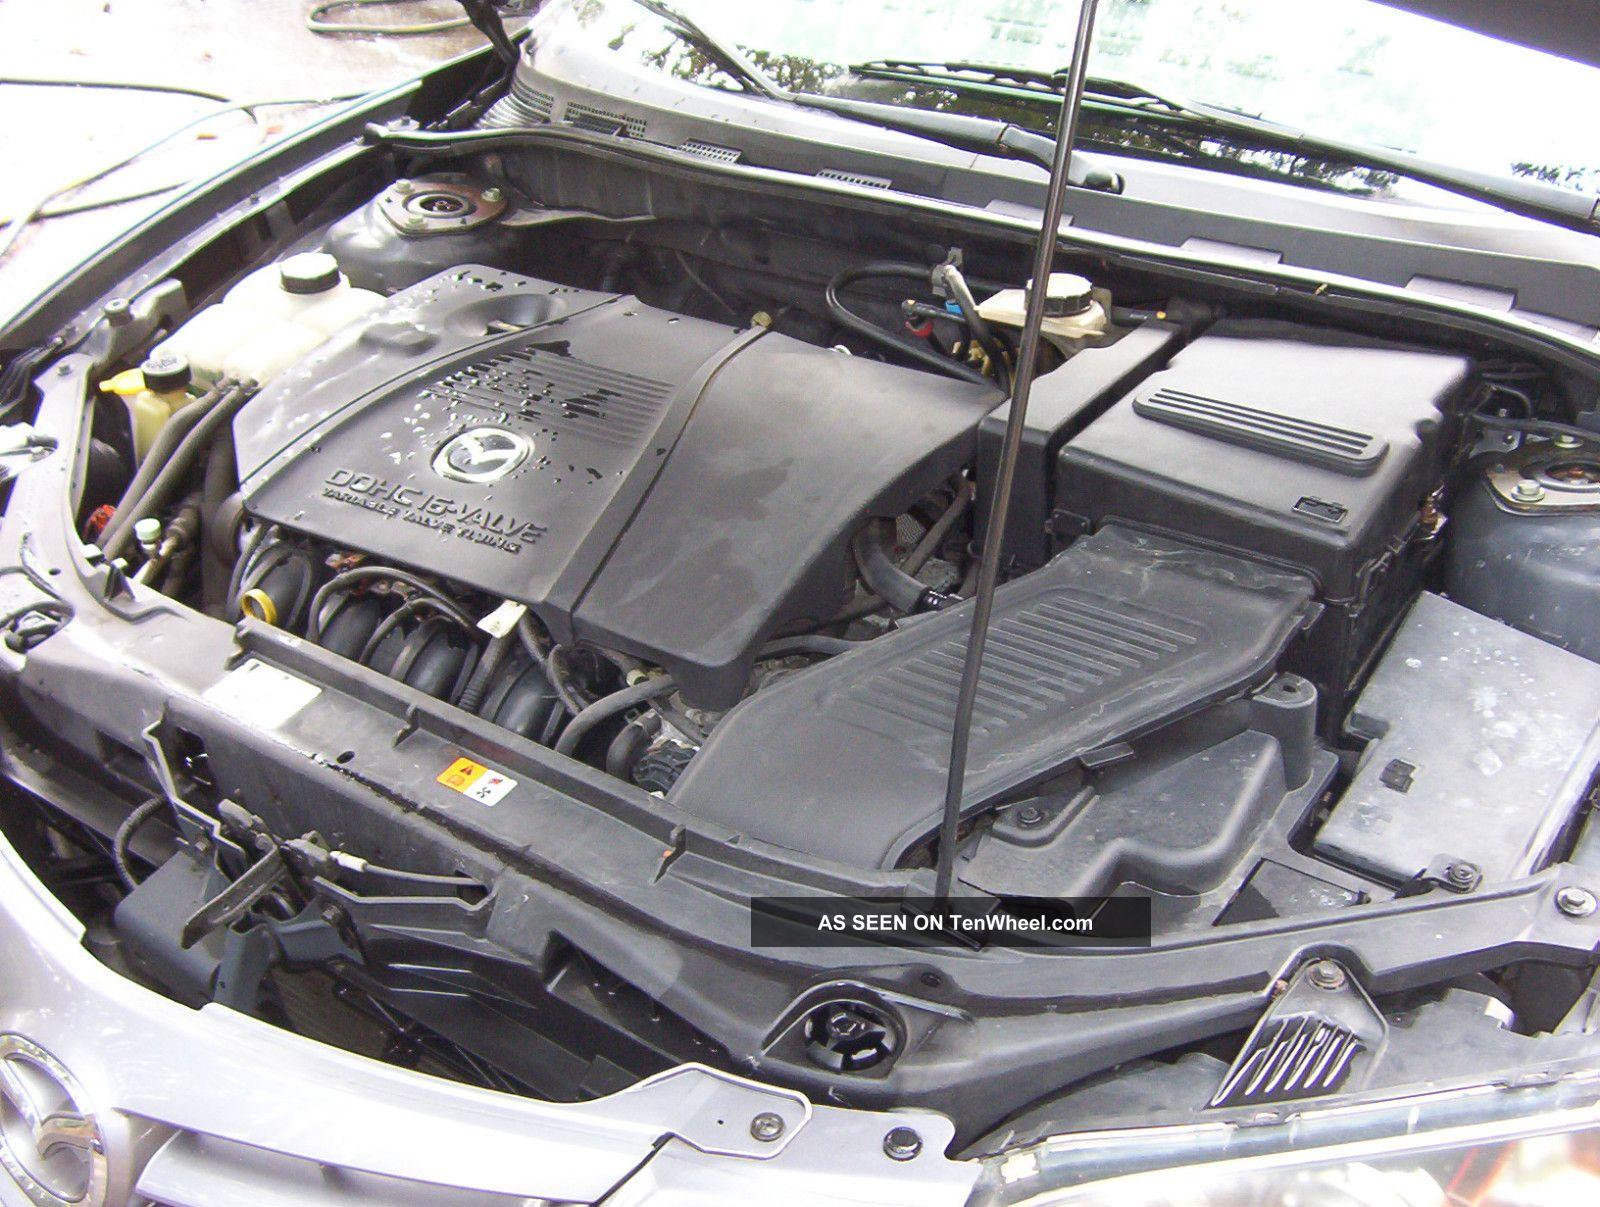 2004 mazda3 gray s sport stick shift inspected needs engine rod 2005 BMW 330Xi 2006 BMW 330Xi